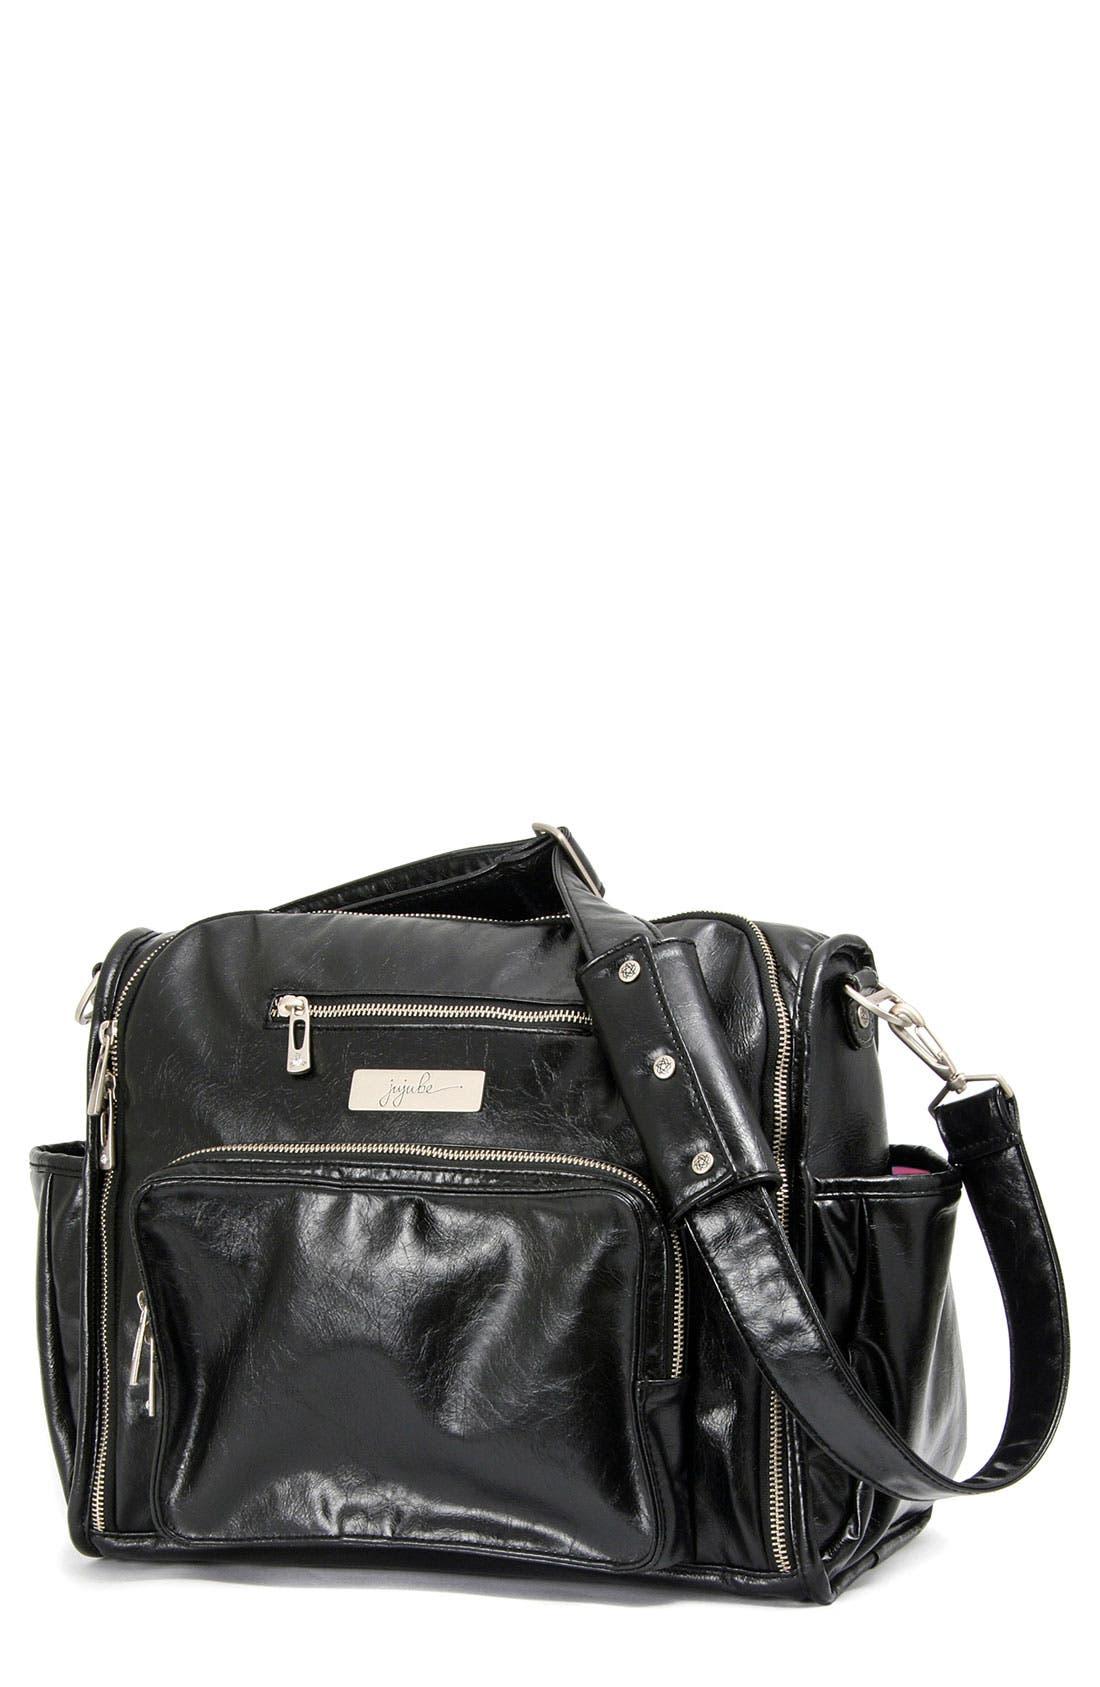 Main Image - Ju-Ju-Be 'Be Fabulous' Earth Leather™ Faux Leather Diaper Bag